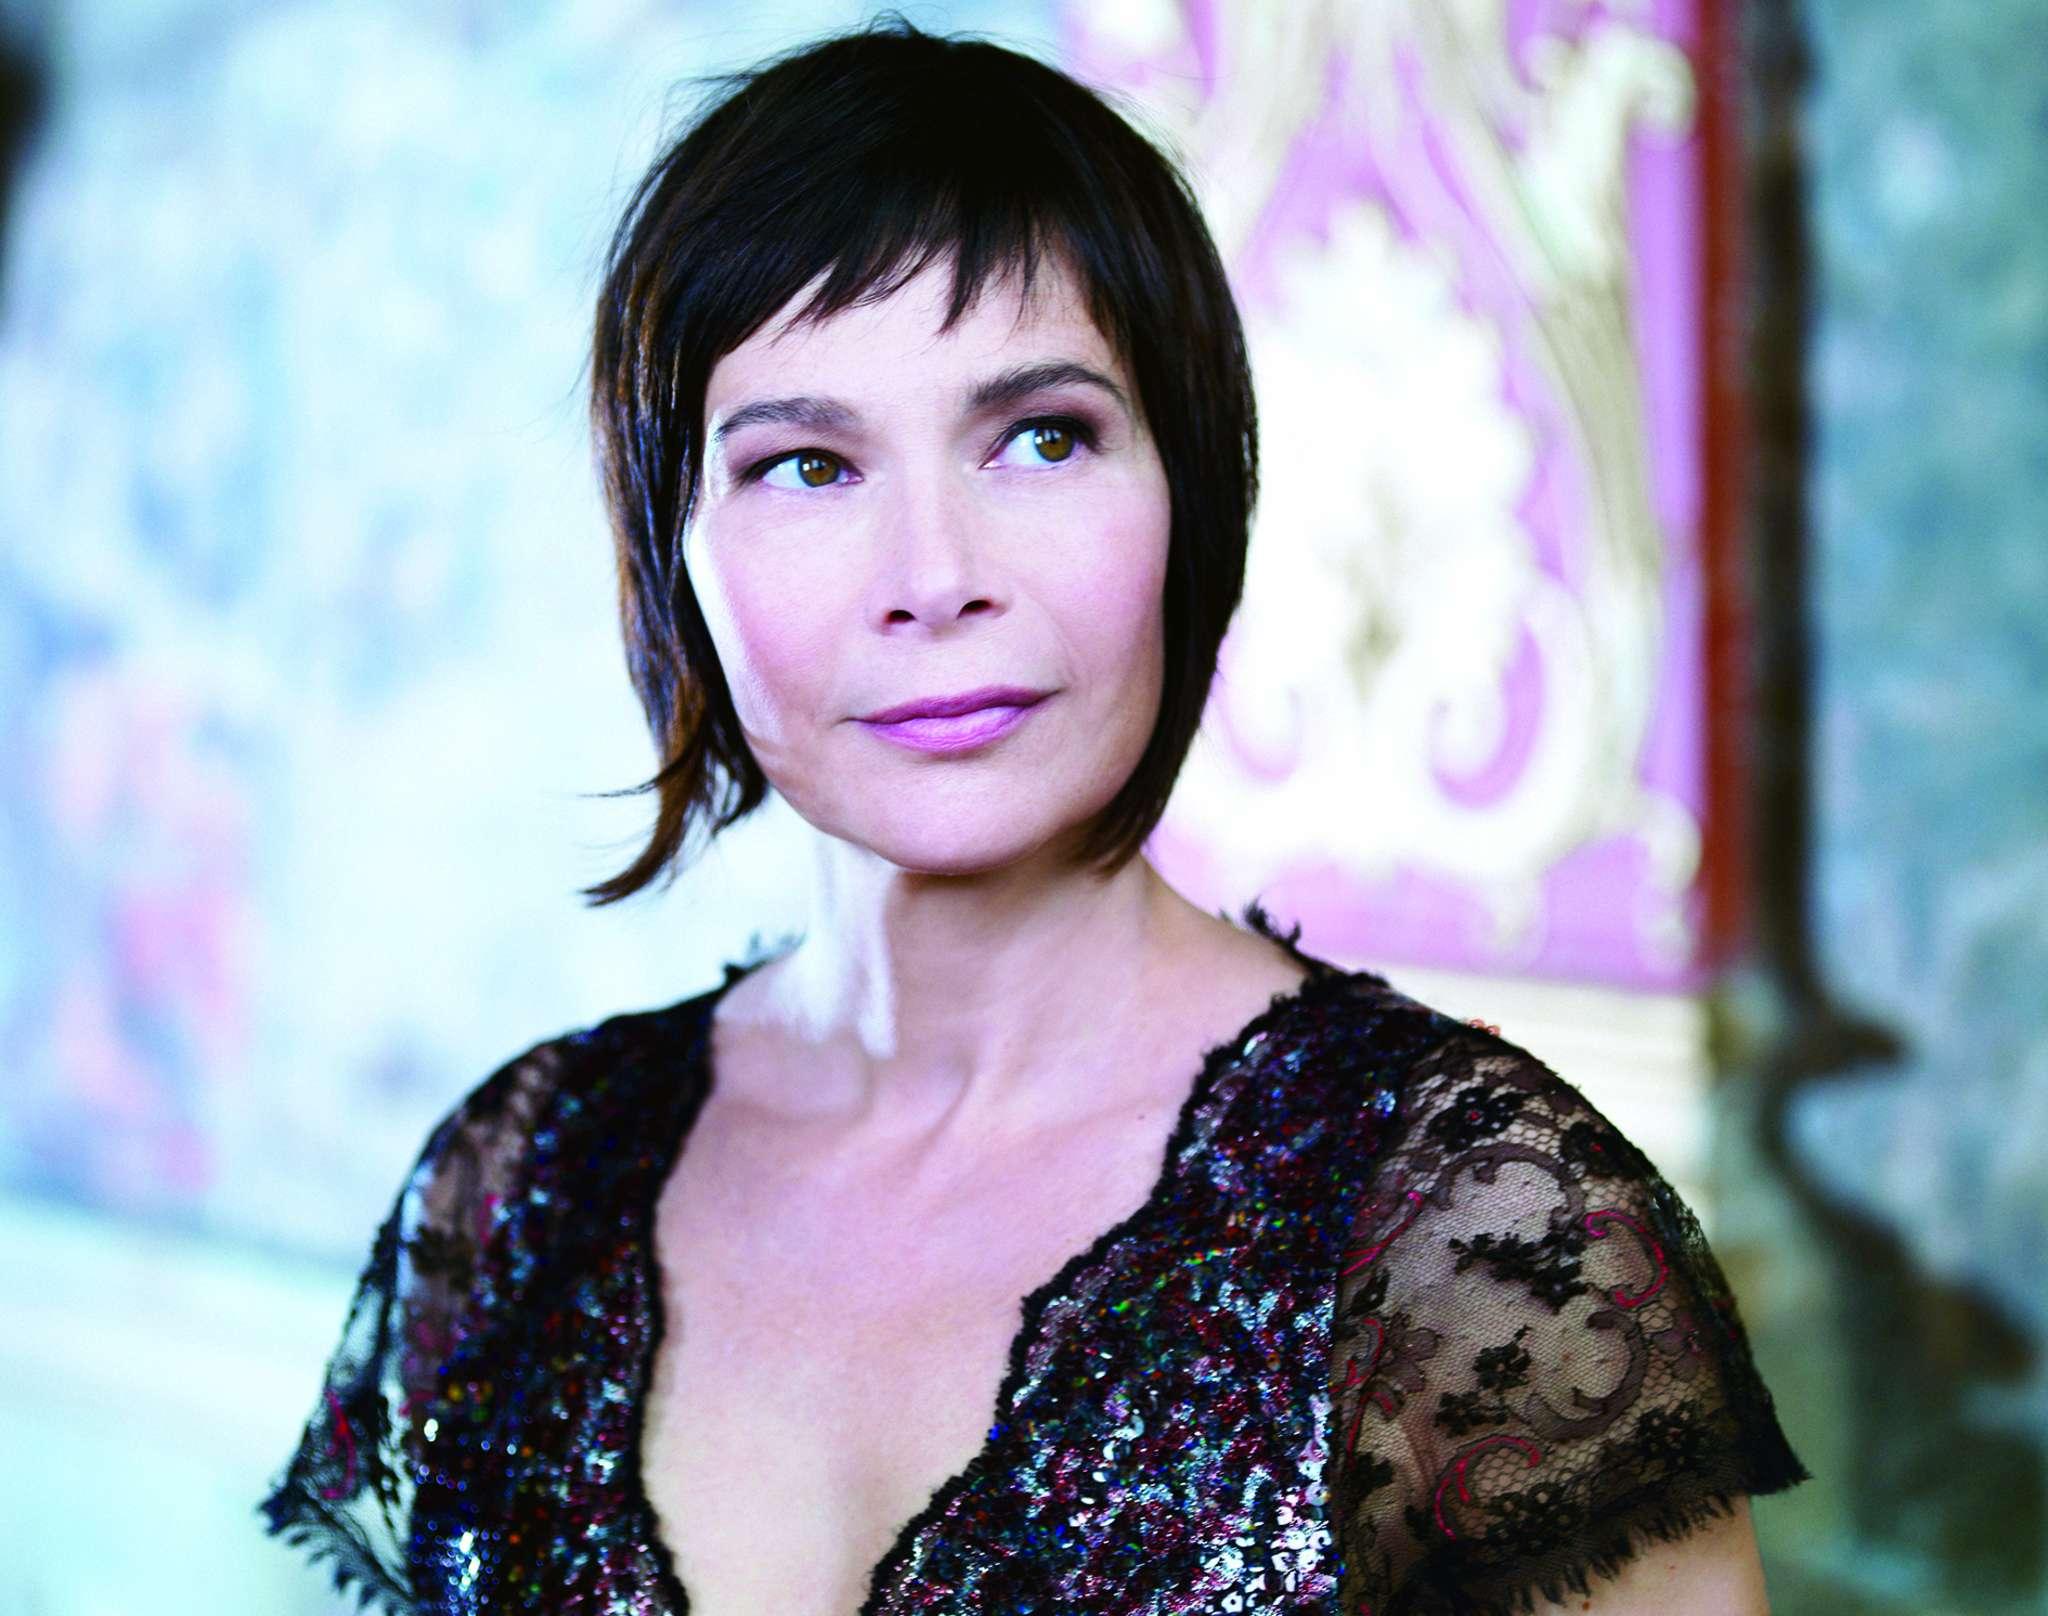 Baroque opera star Sandrine Piau will make a rare U.S. appearance at the Kimmel Center on Feb. 14 for a Philadelphia Chamber Music Society recital.